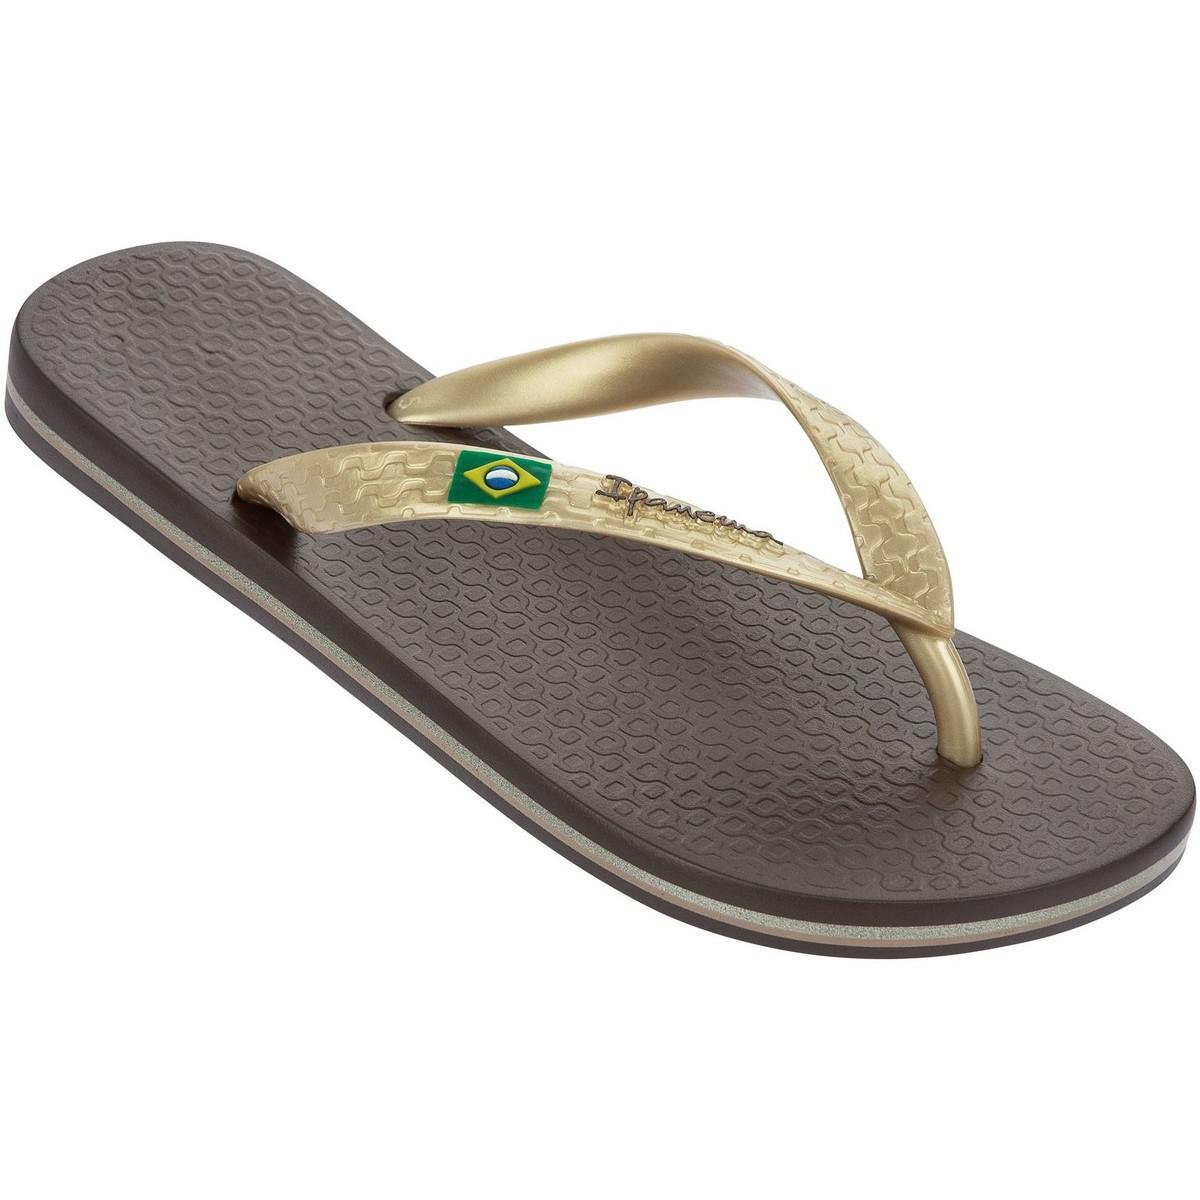 Ipanema Brazil Ii Flag Sandals In Brown Gold 80408a Women s Flip ... bebbf0be4a